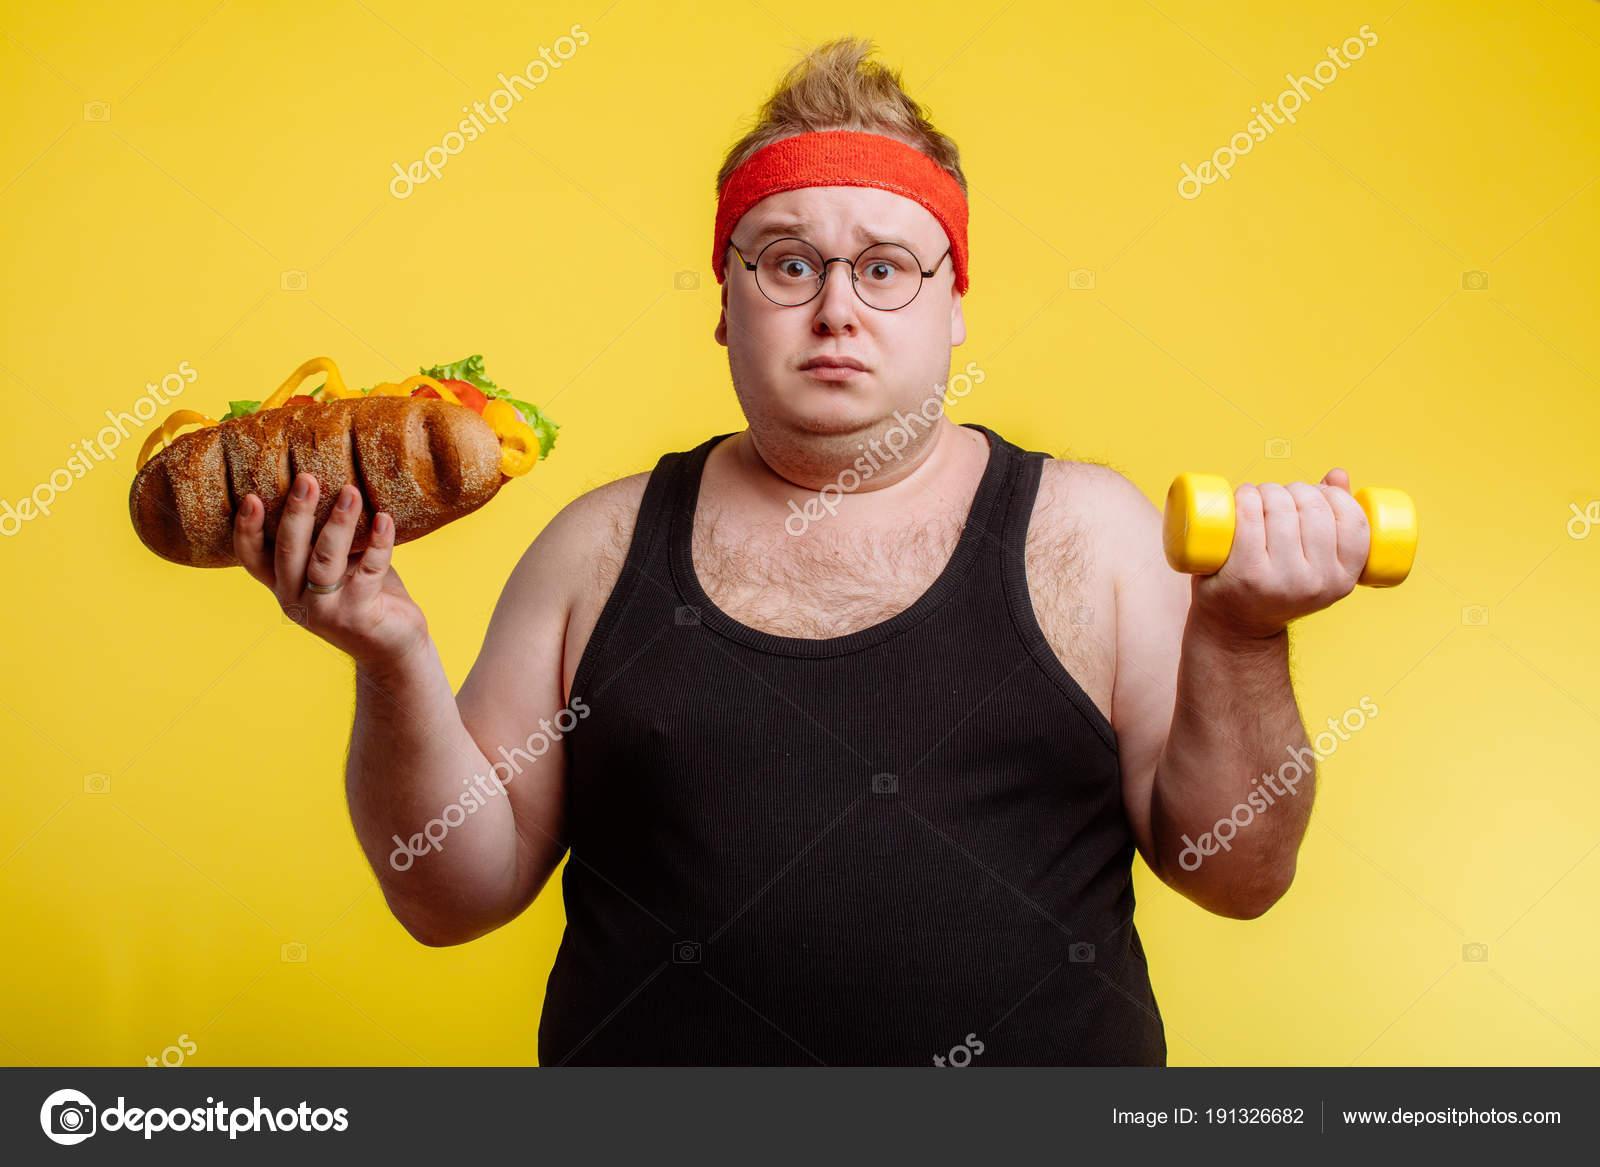 Große dicke Sportler